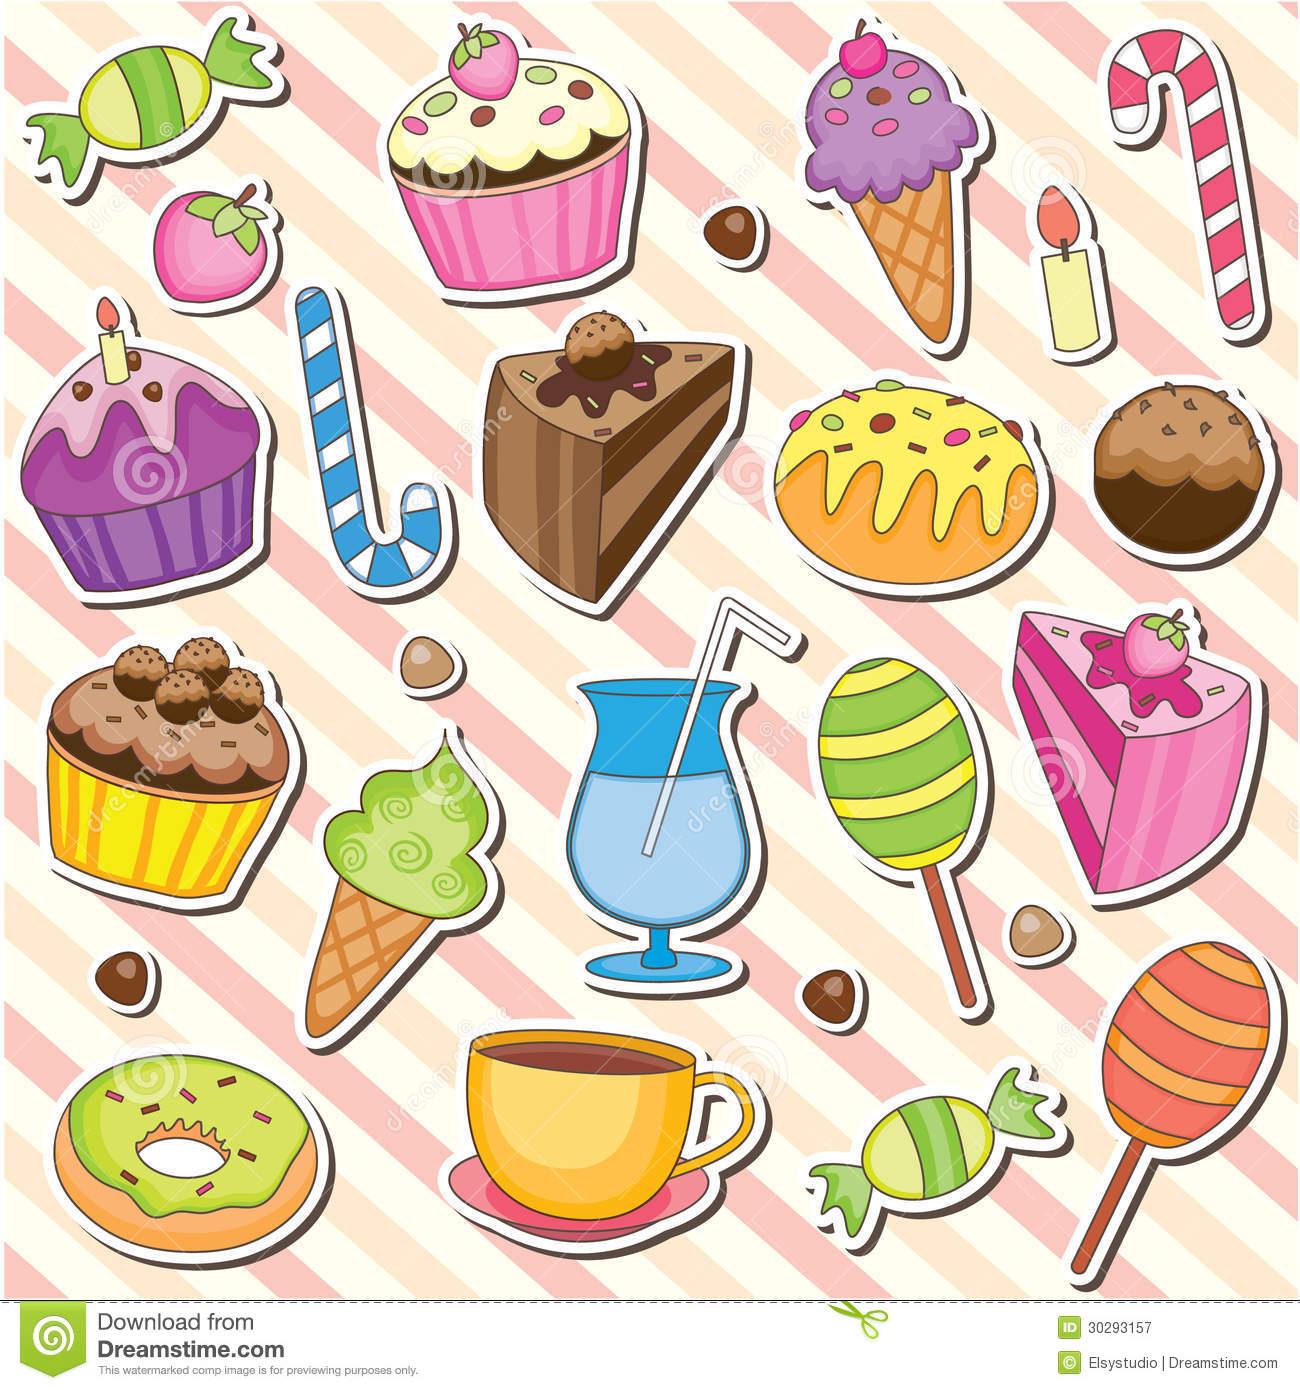 Desserts clipart. Free download